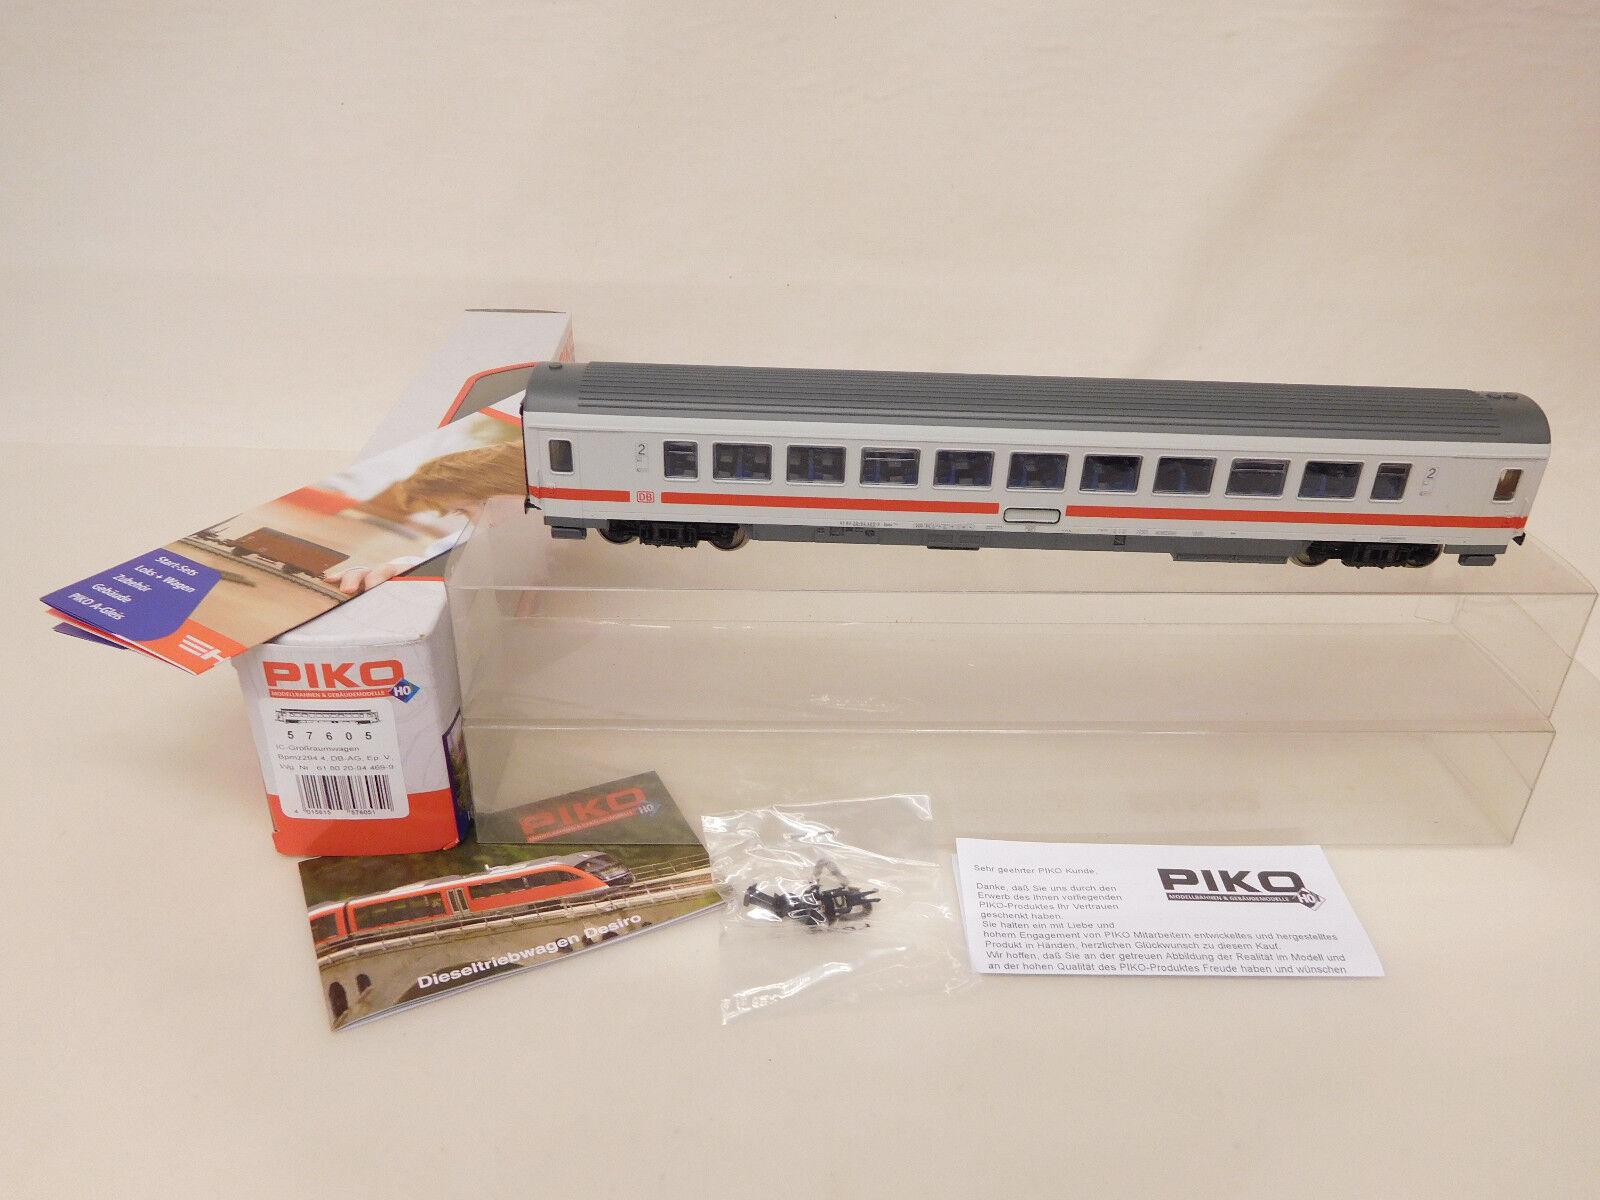 MES-56873 Piko 57605 H0 IC Großraumwagen DB 618020-94469-9 2.Kl.